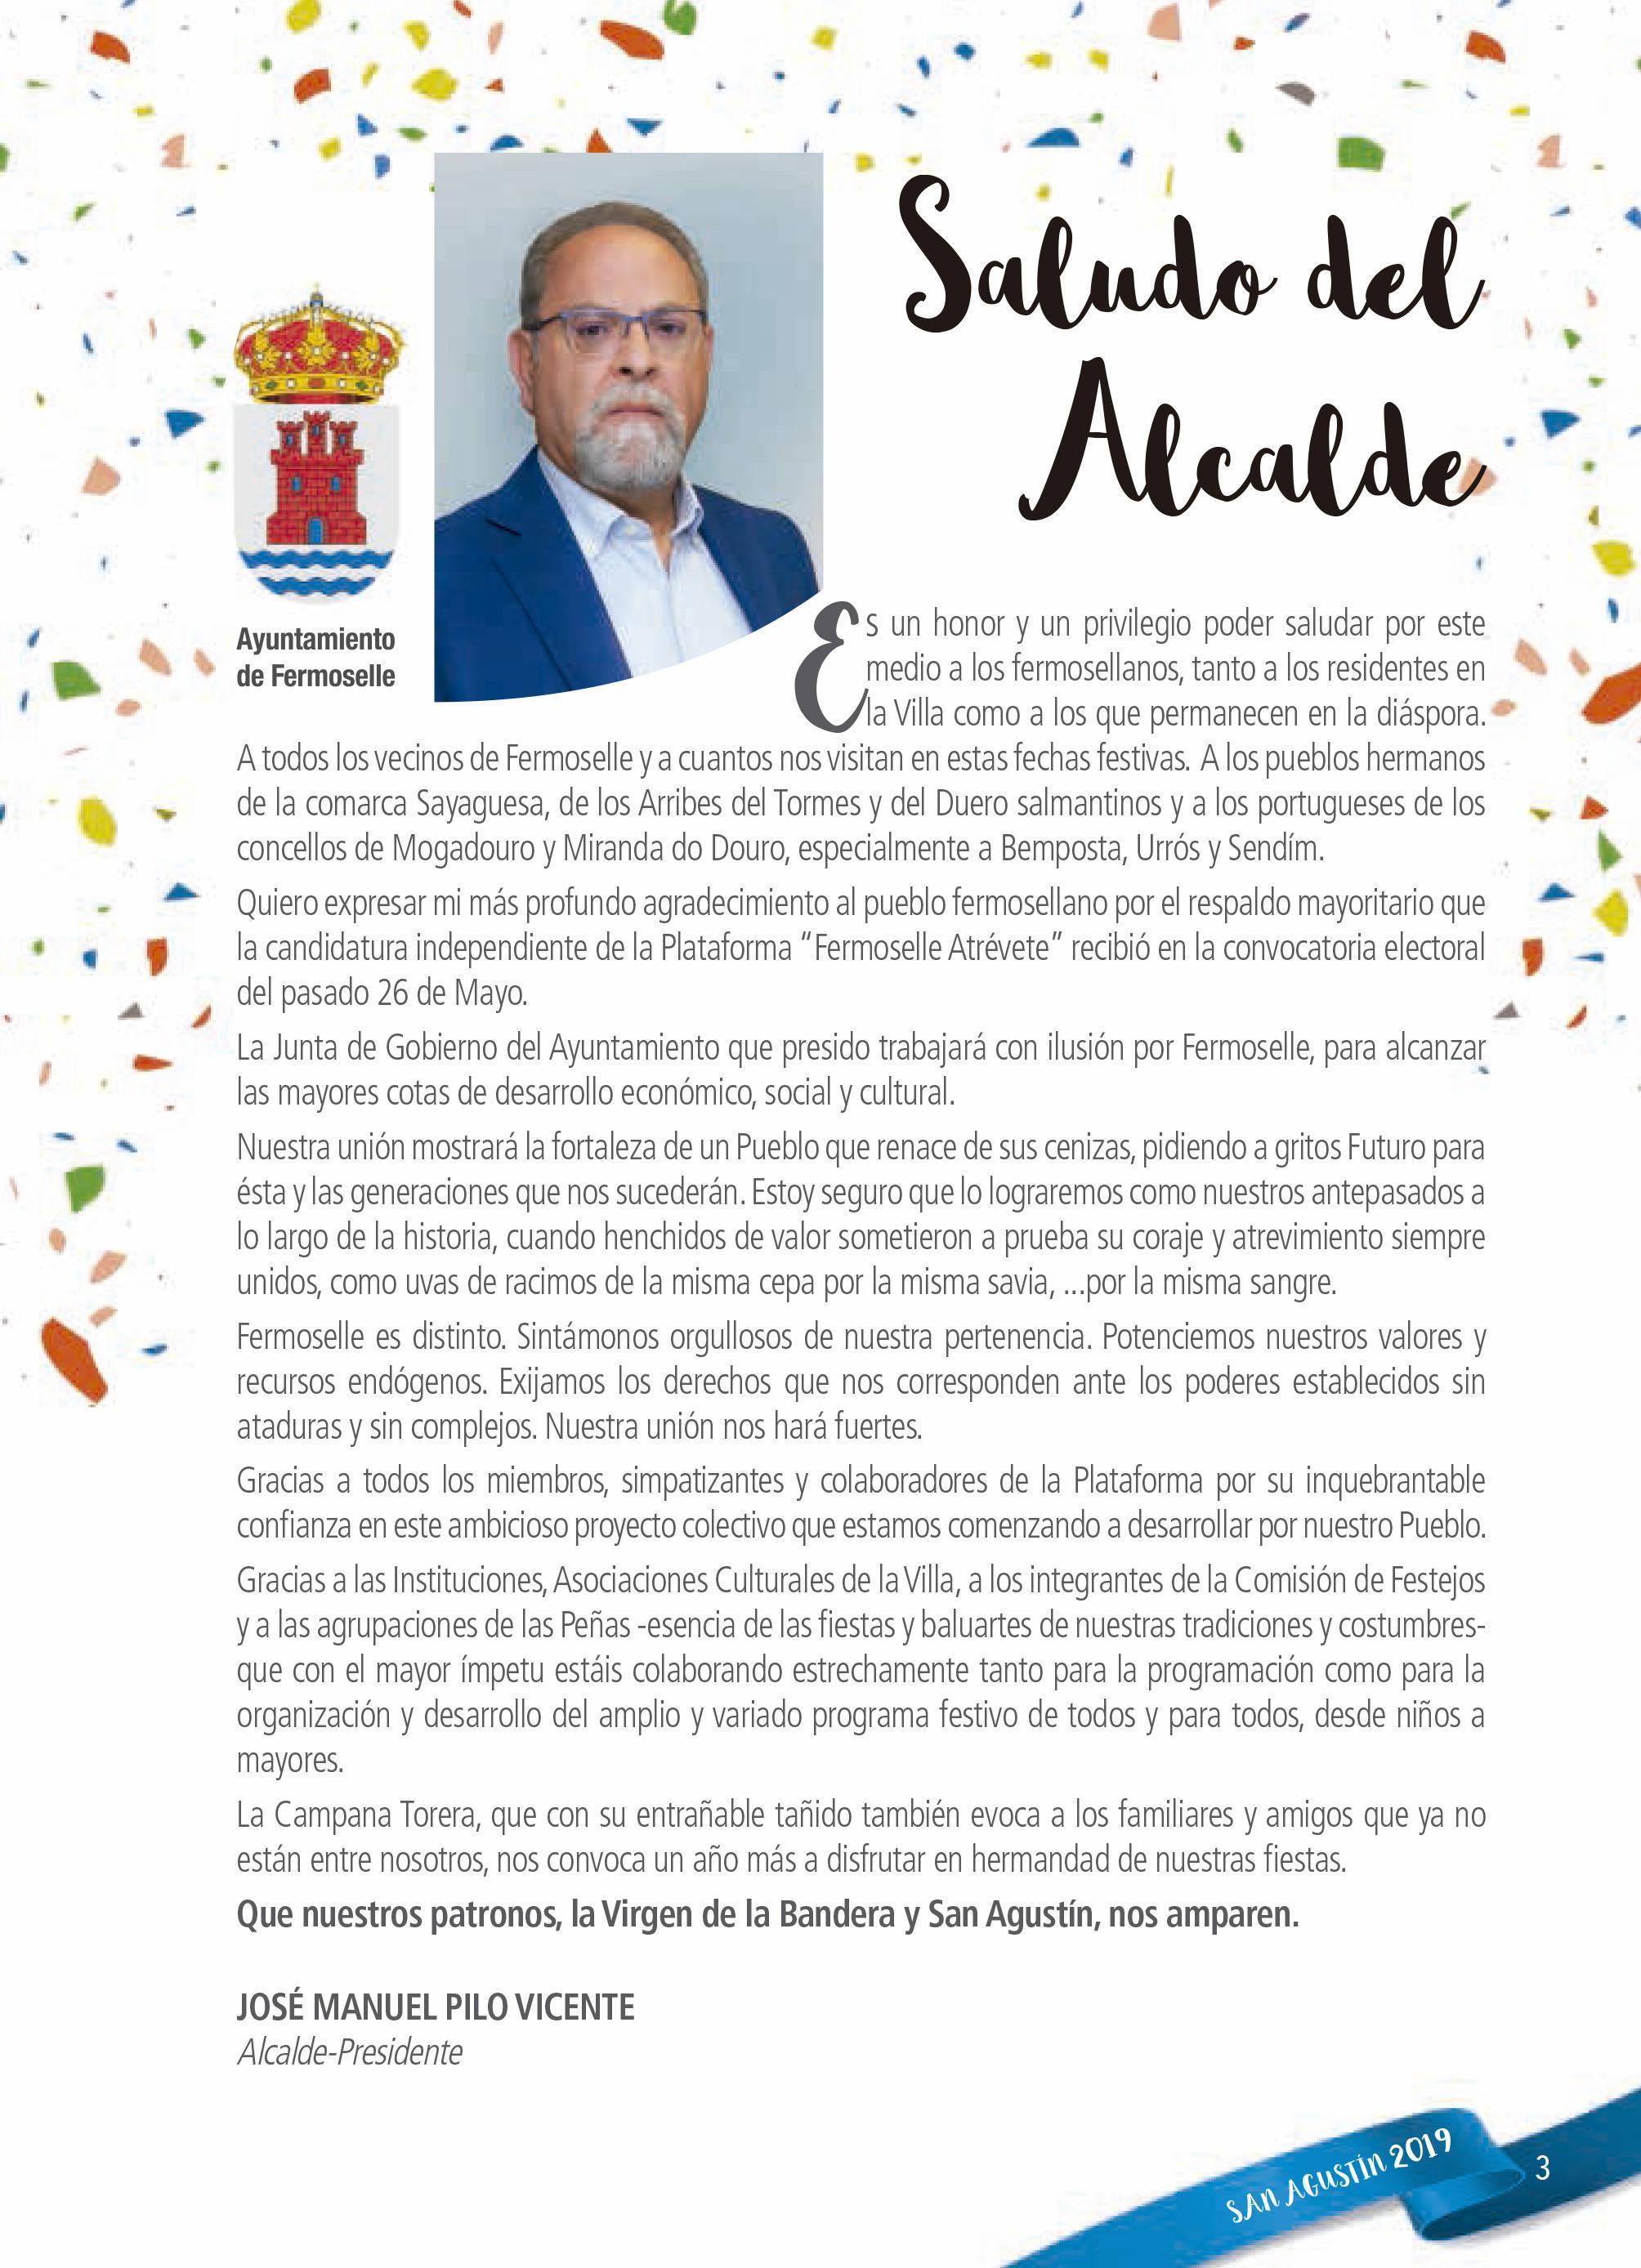 Programa de ferias y fiestas 2019 - Fermoselle (Zamora) 3